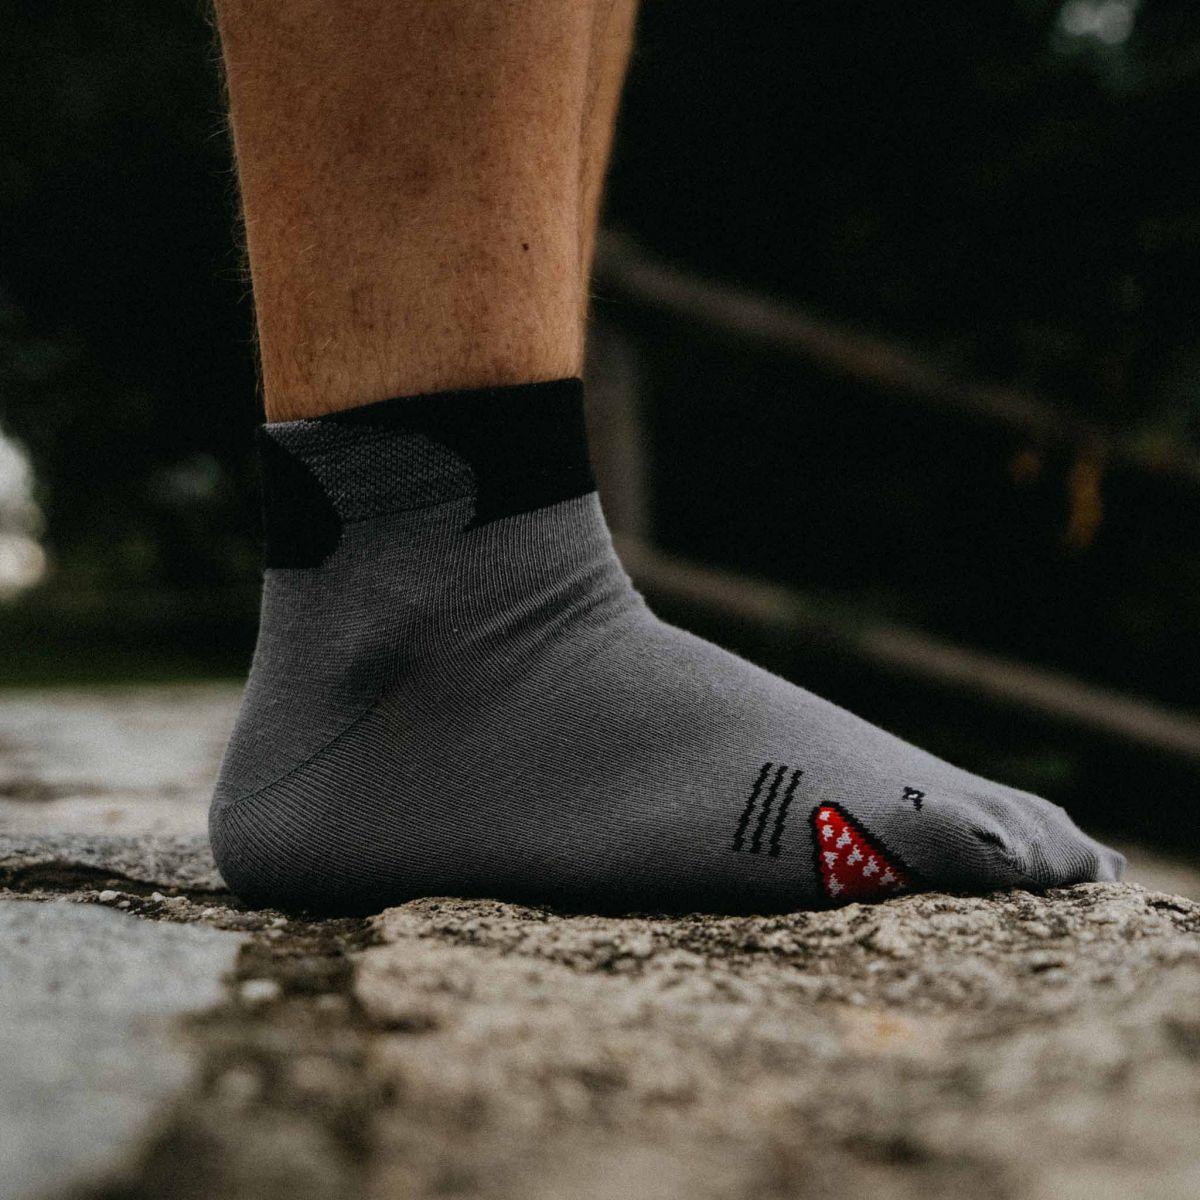 Ponožky - Žralok p4